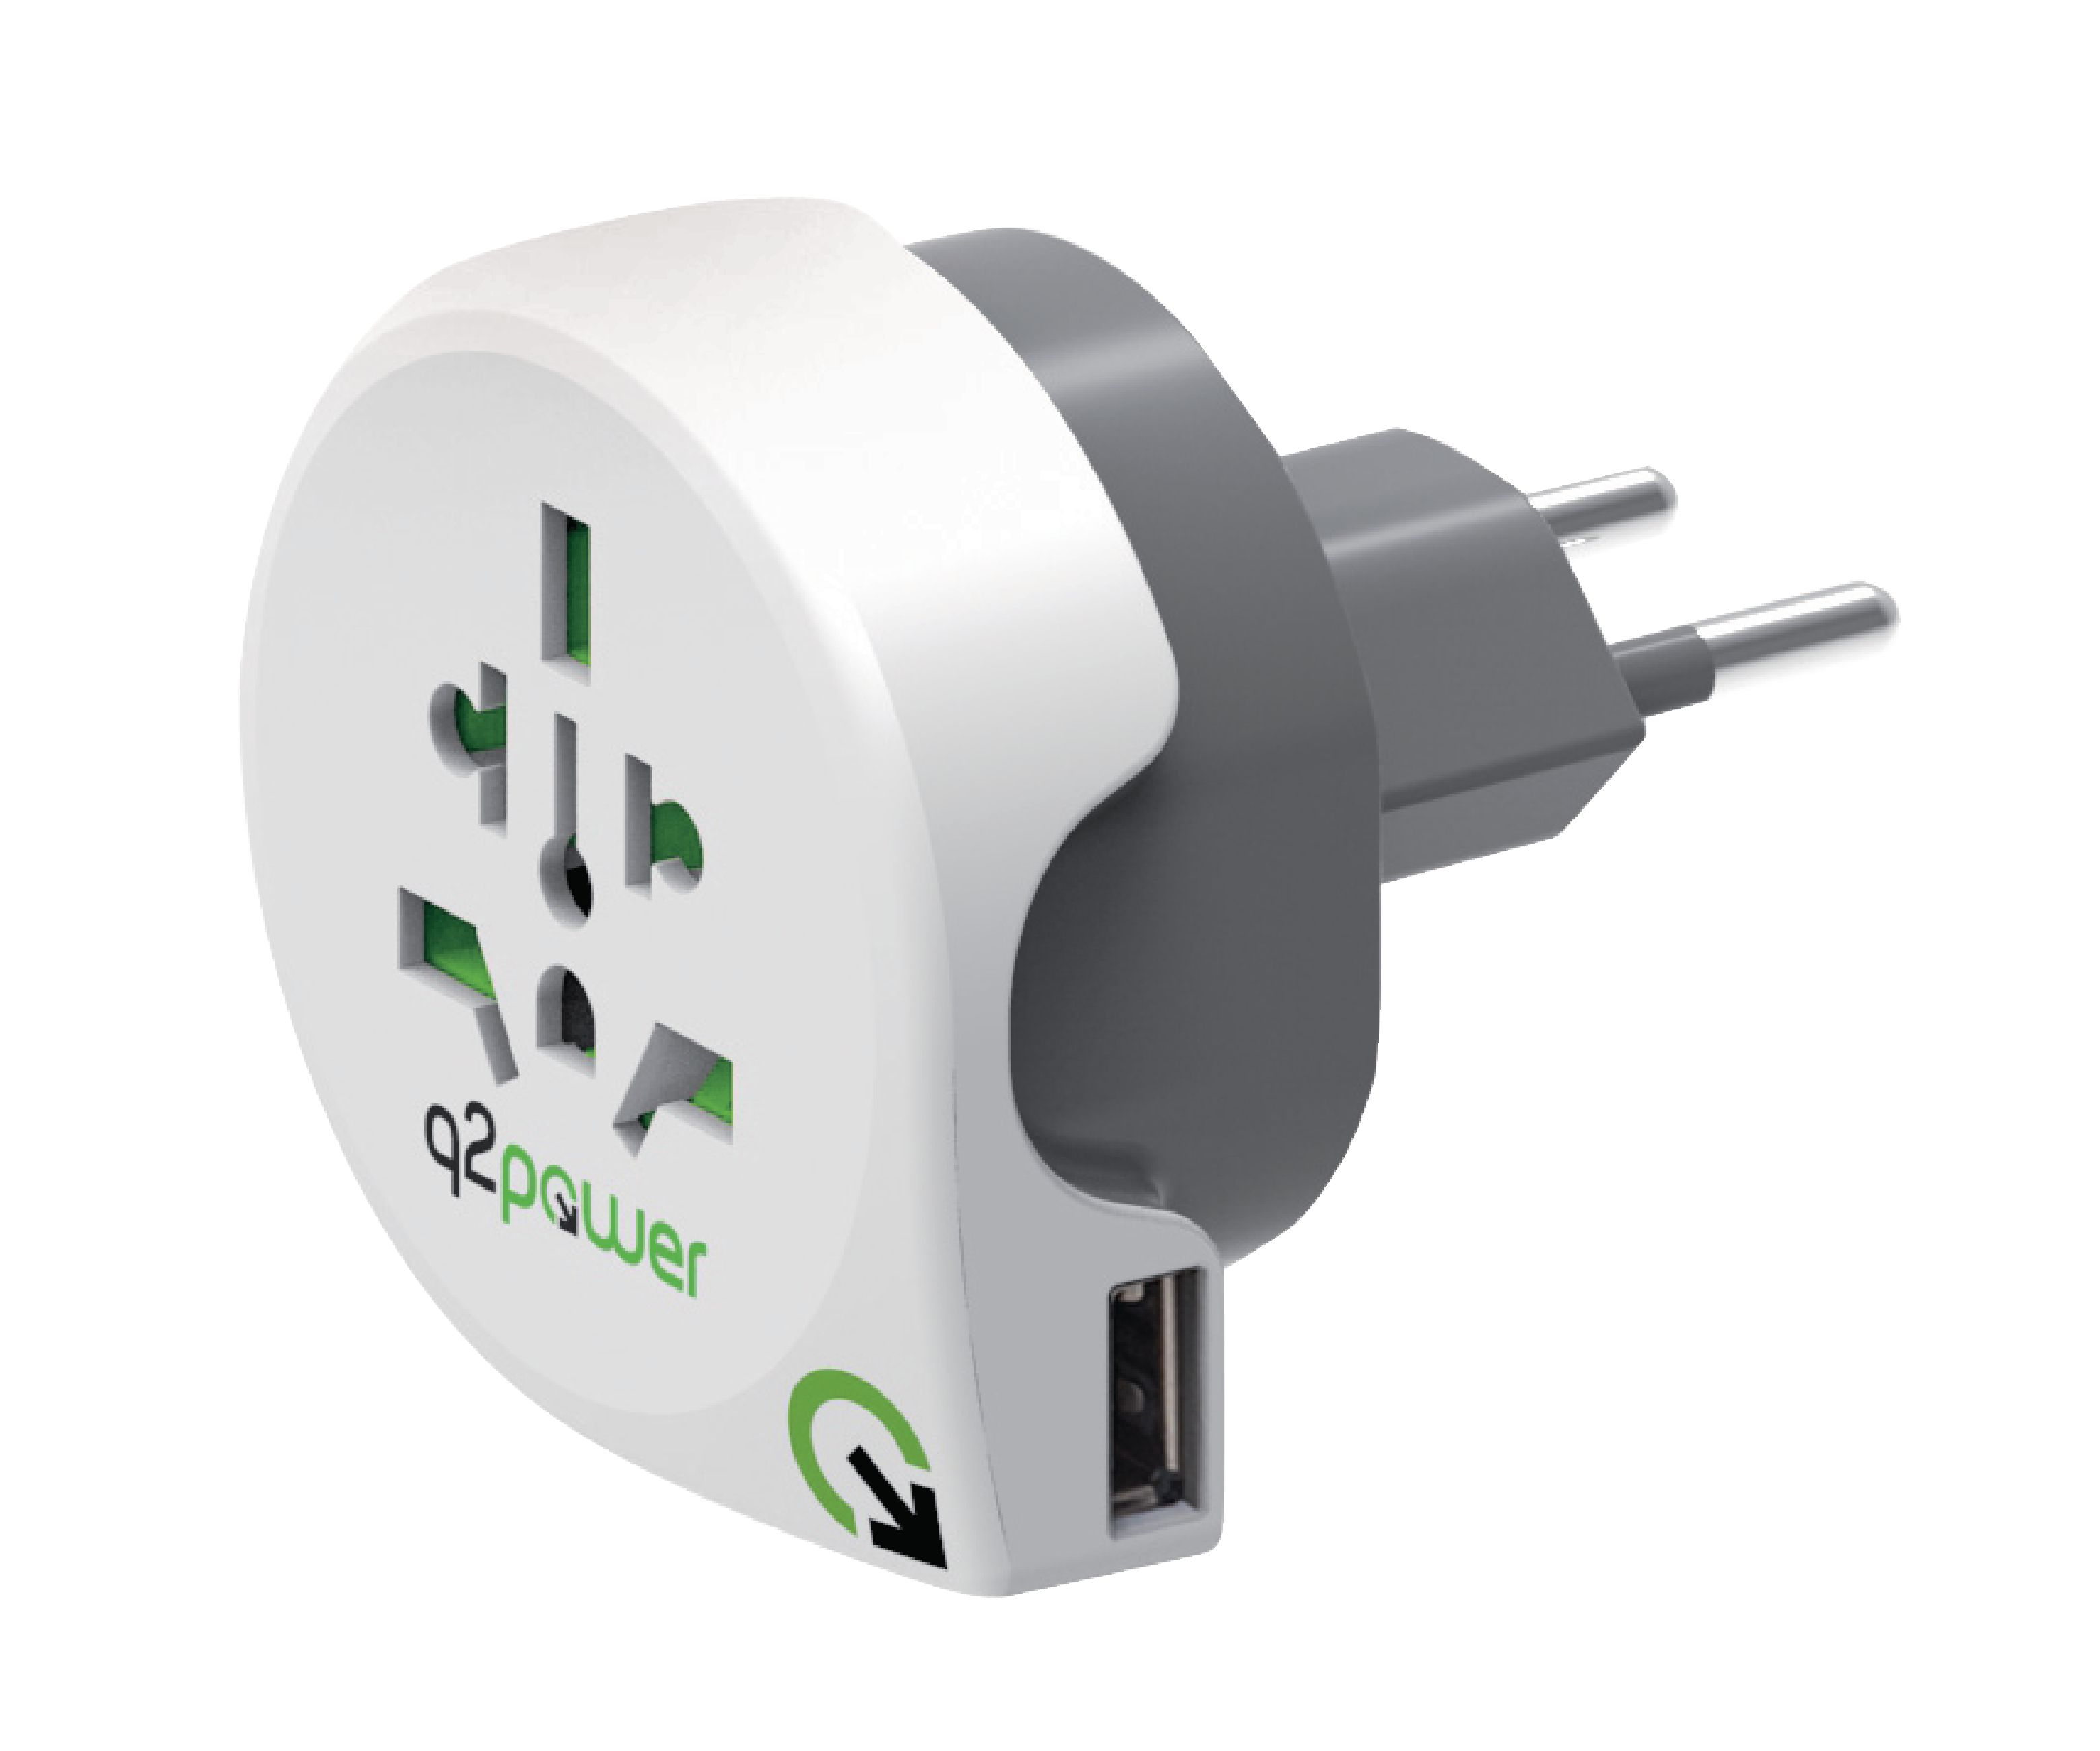 plug power q2 ups electrical wiring diagram matka adapteri world to switzerland usb 1 100210 q2power